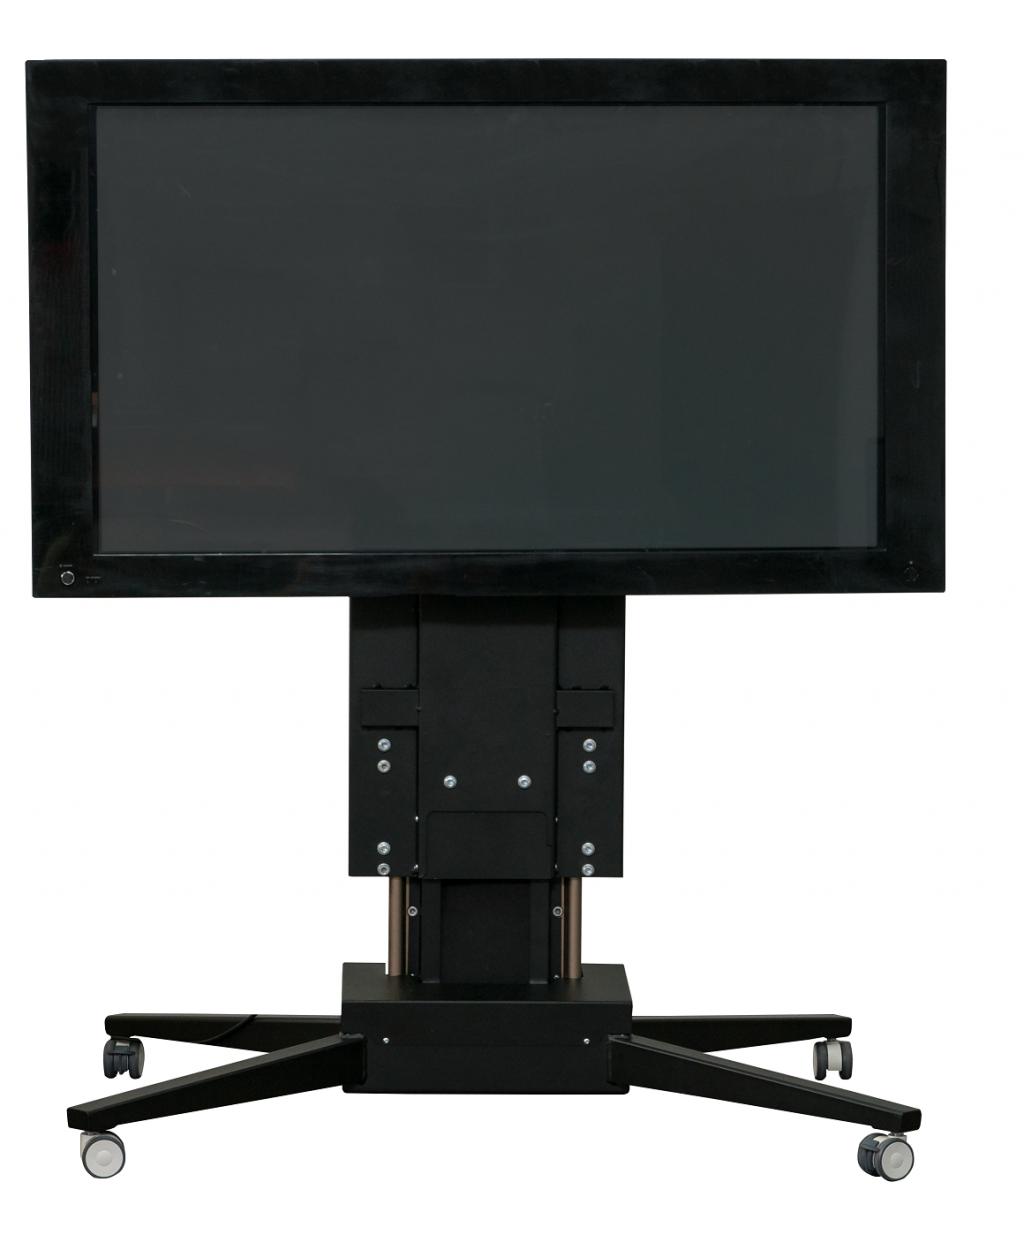 Sabaj Mobil Tv - Lyft / Hiss 65cm lyfthöjd, 80kg kapacitet